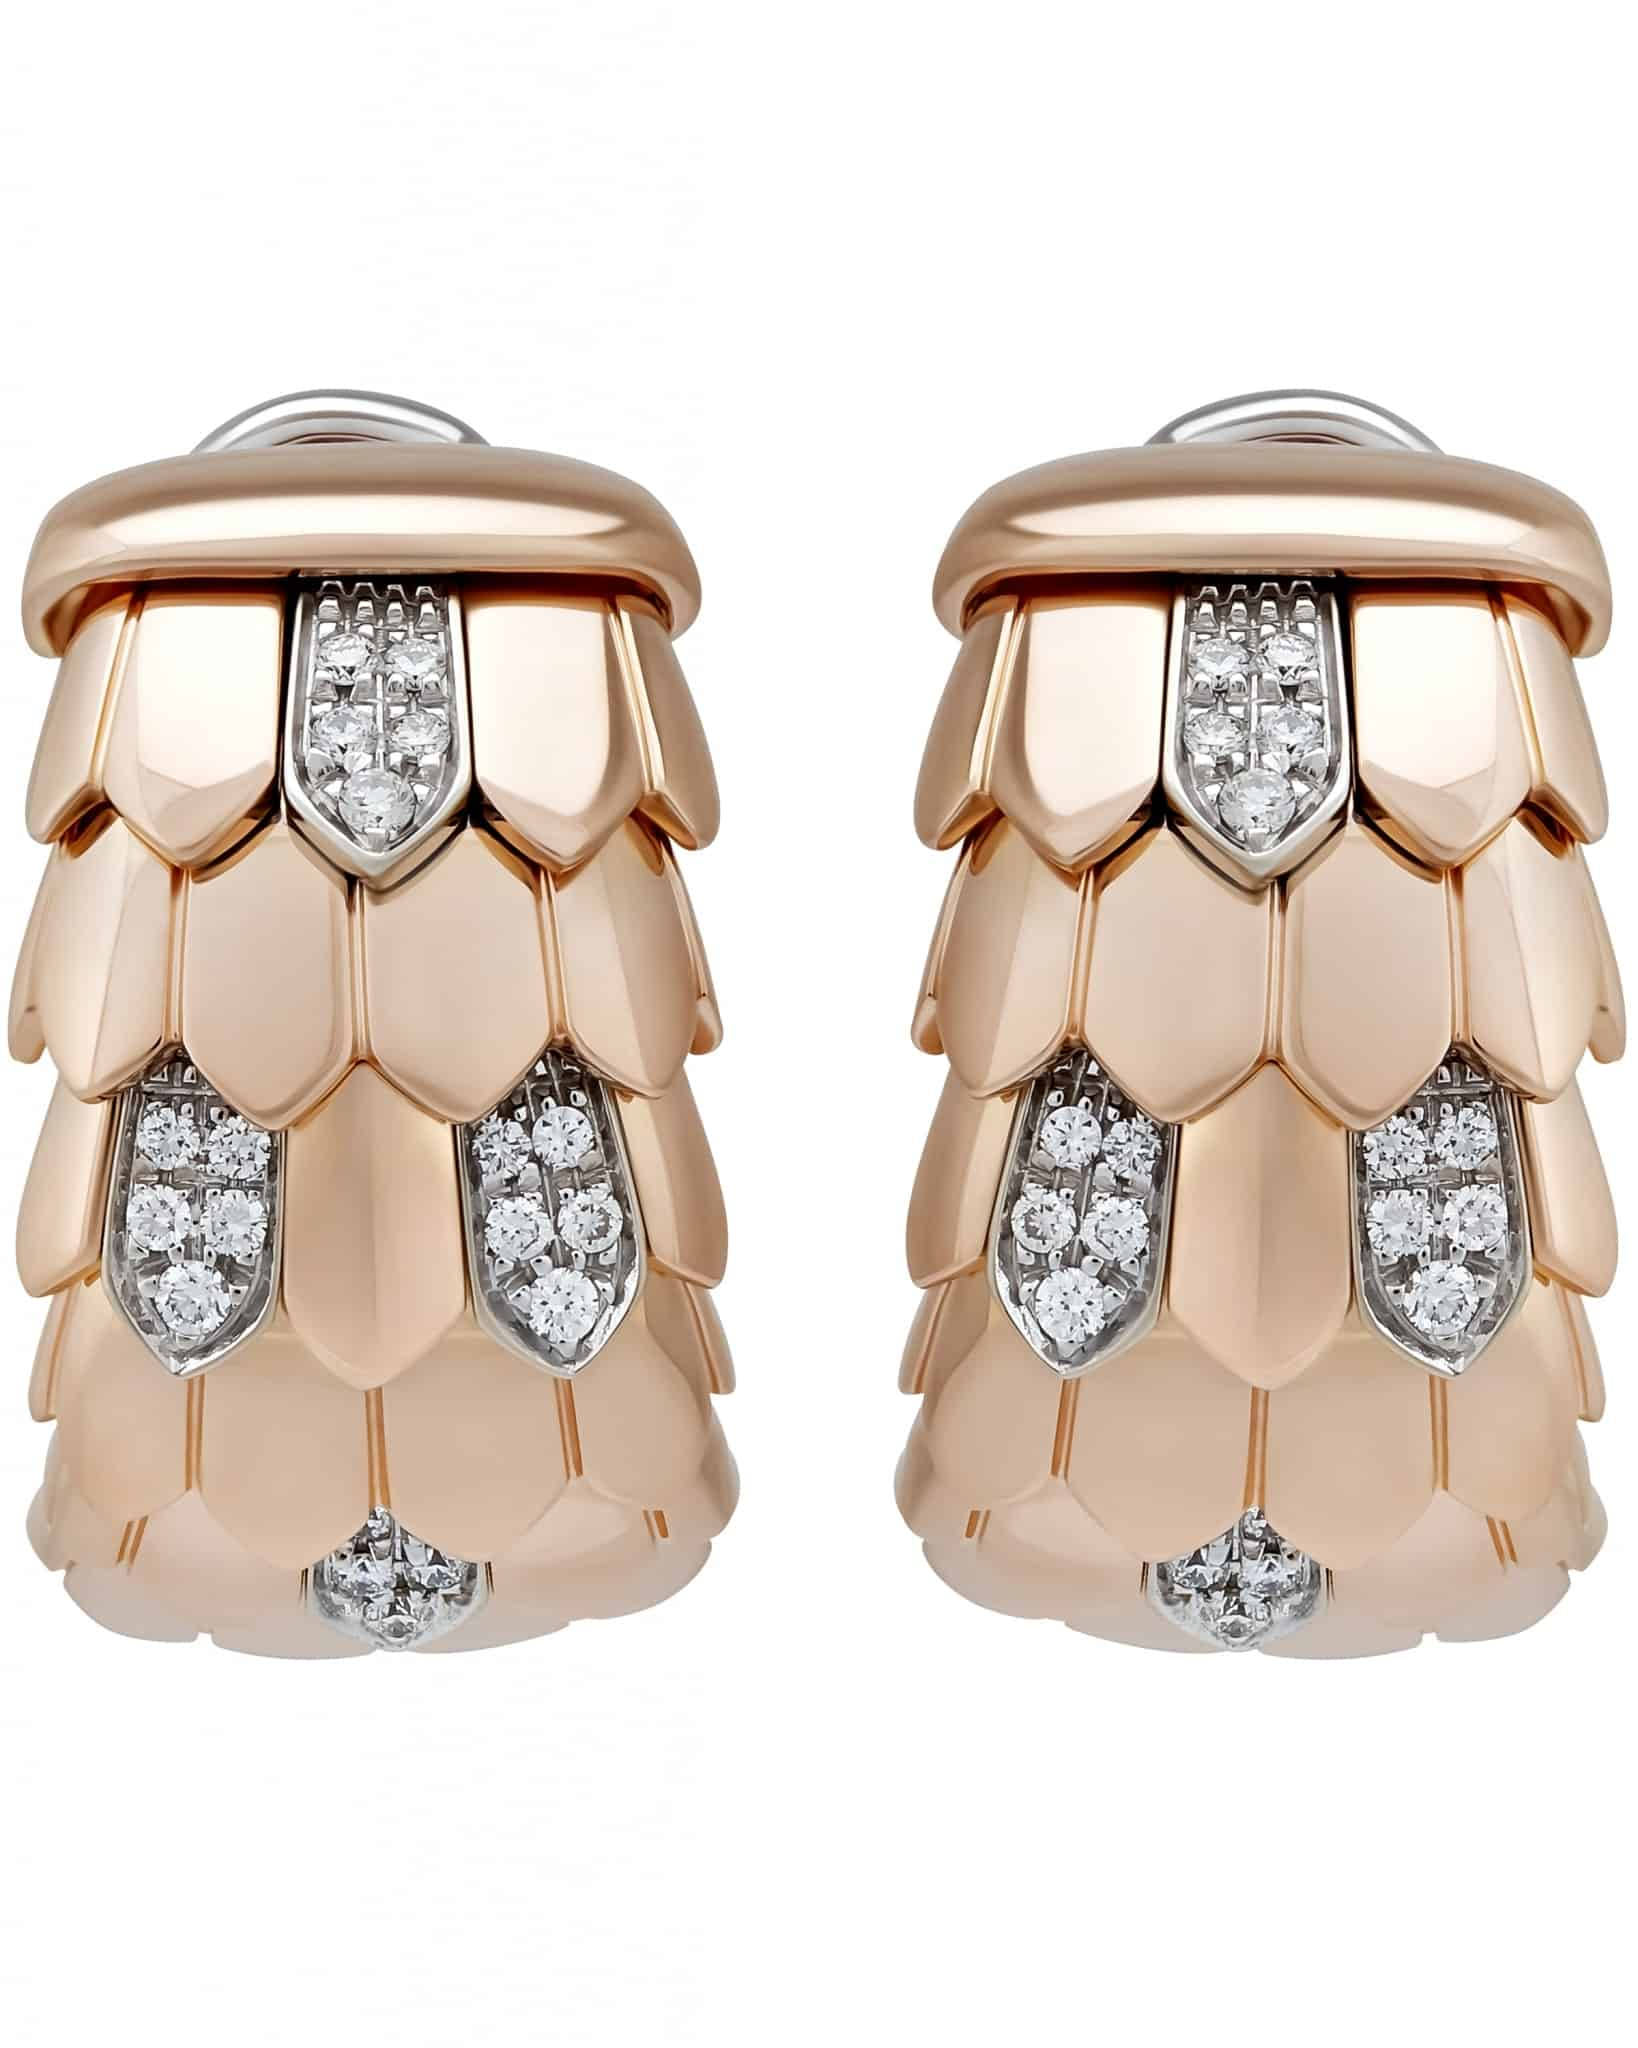 Roberto Coin – 18K Rose Gold, Diamond & Ruby Earrings ADR128EA0367